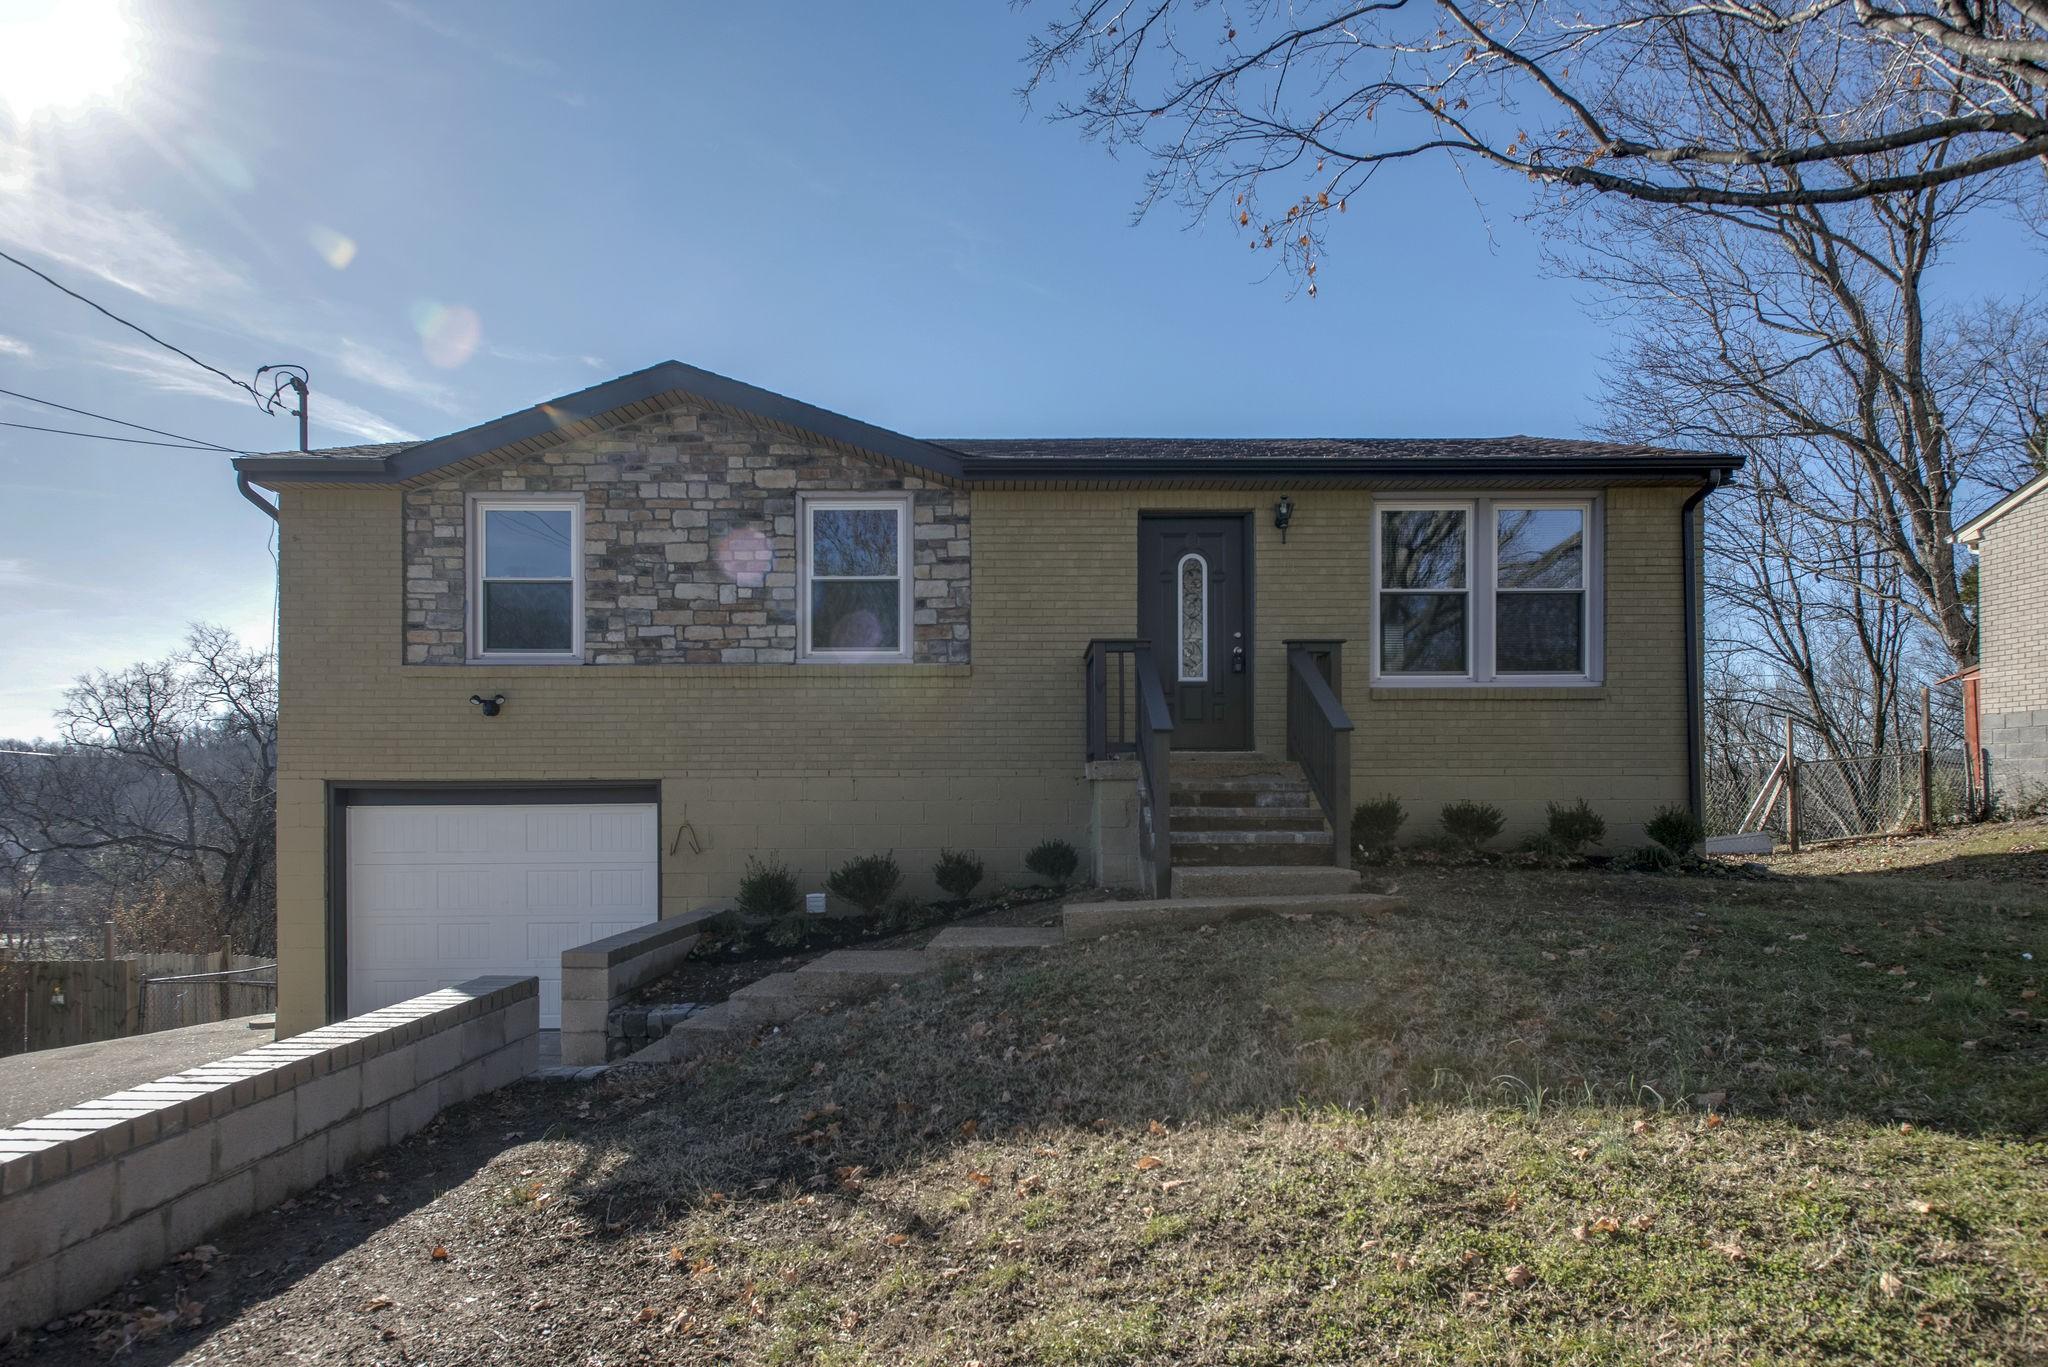 117 Tomarand Rd, Antioch, TN 37013 - Antioch, TN real estate listing